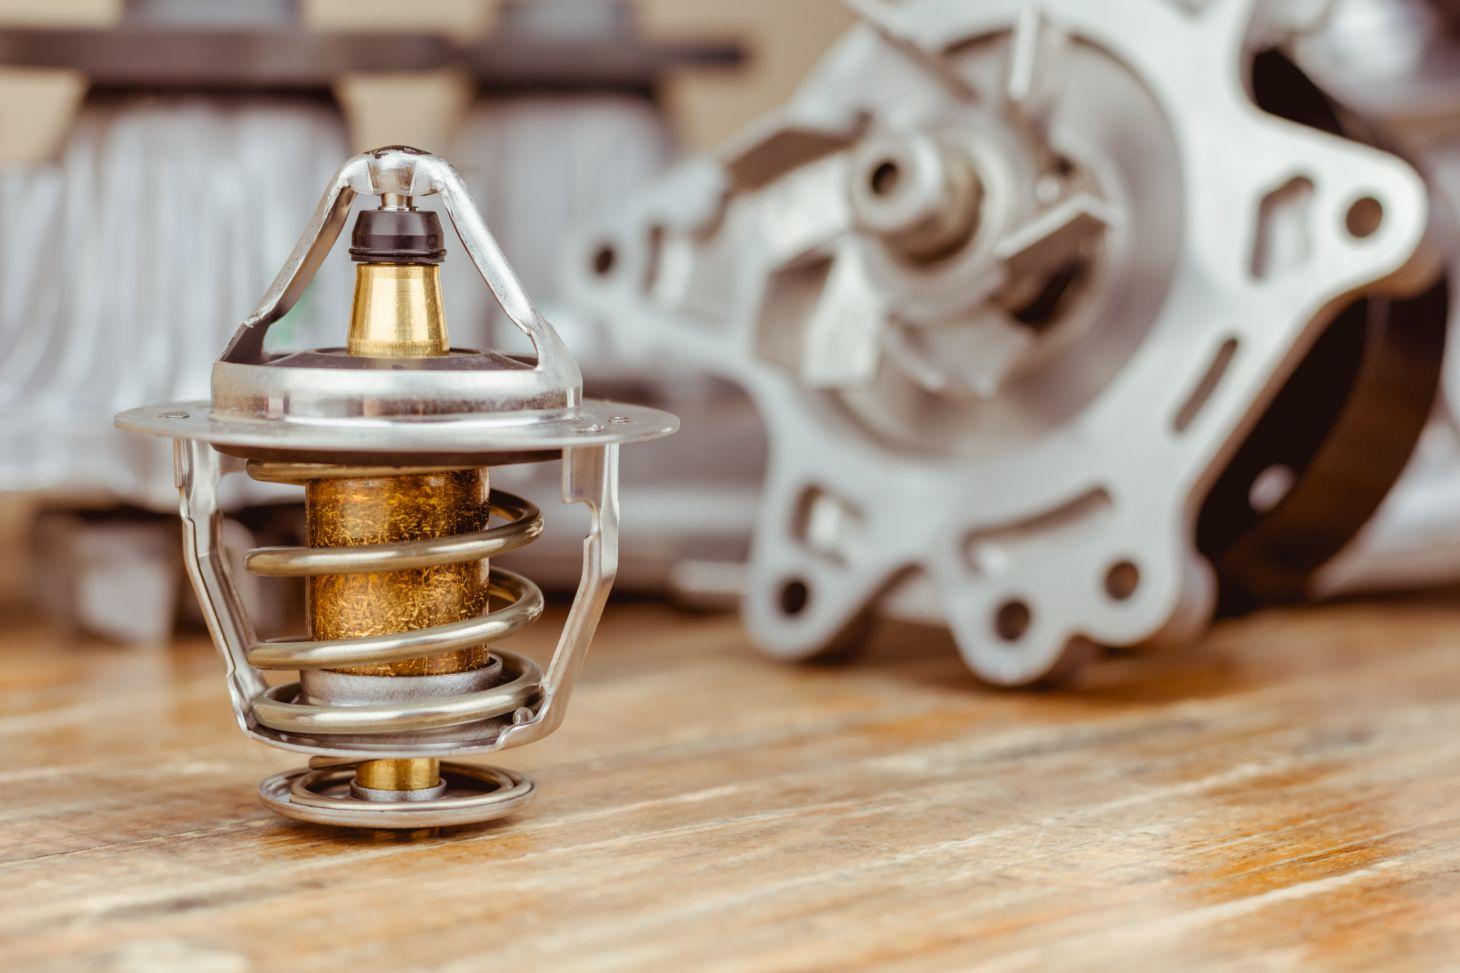 valvula termostatica motor carro carcaca bomba dagua